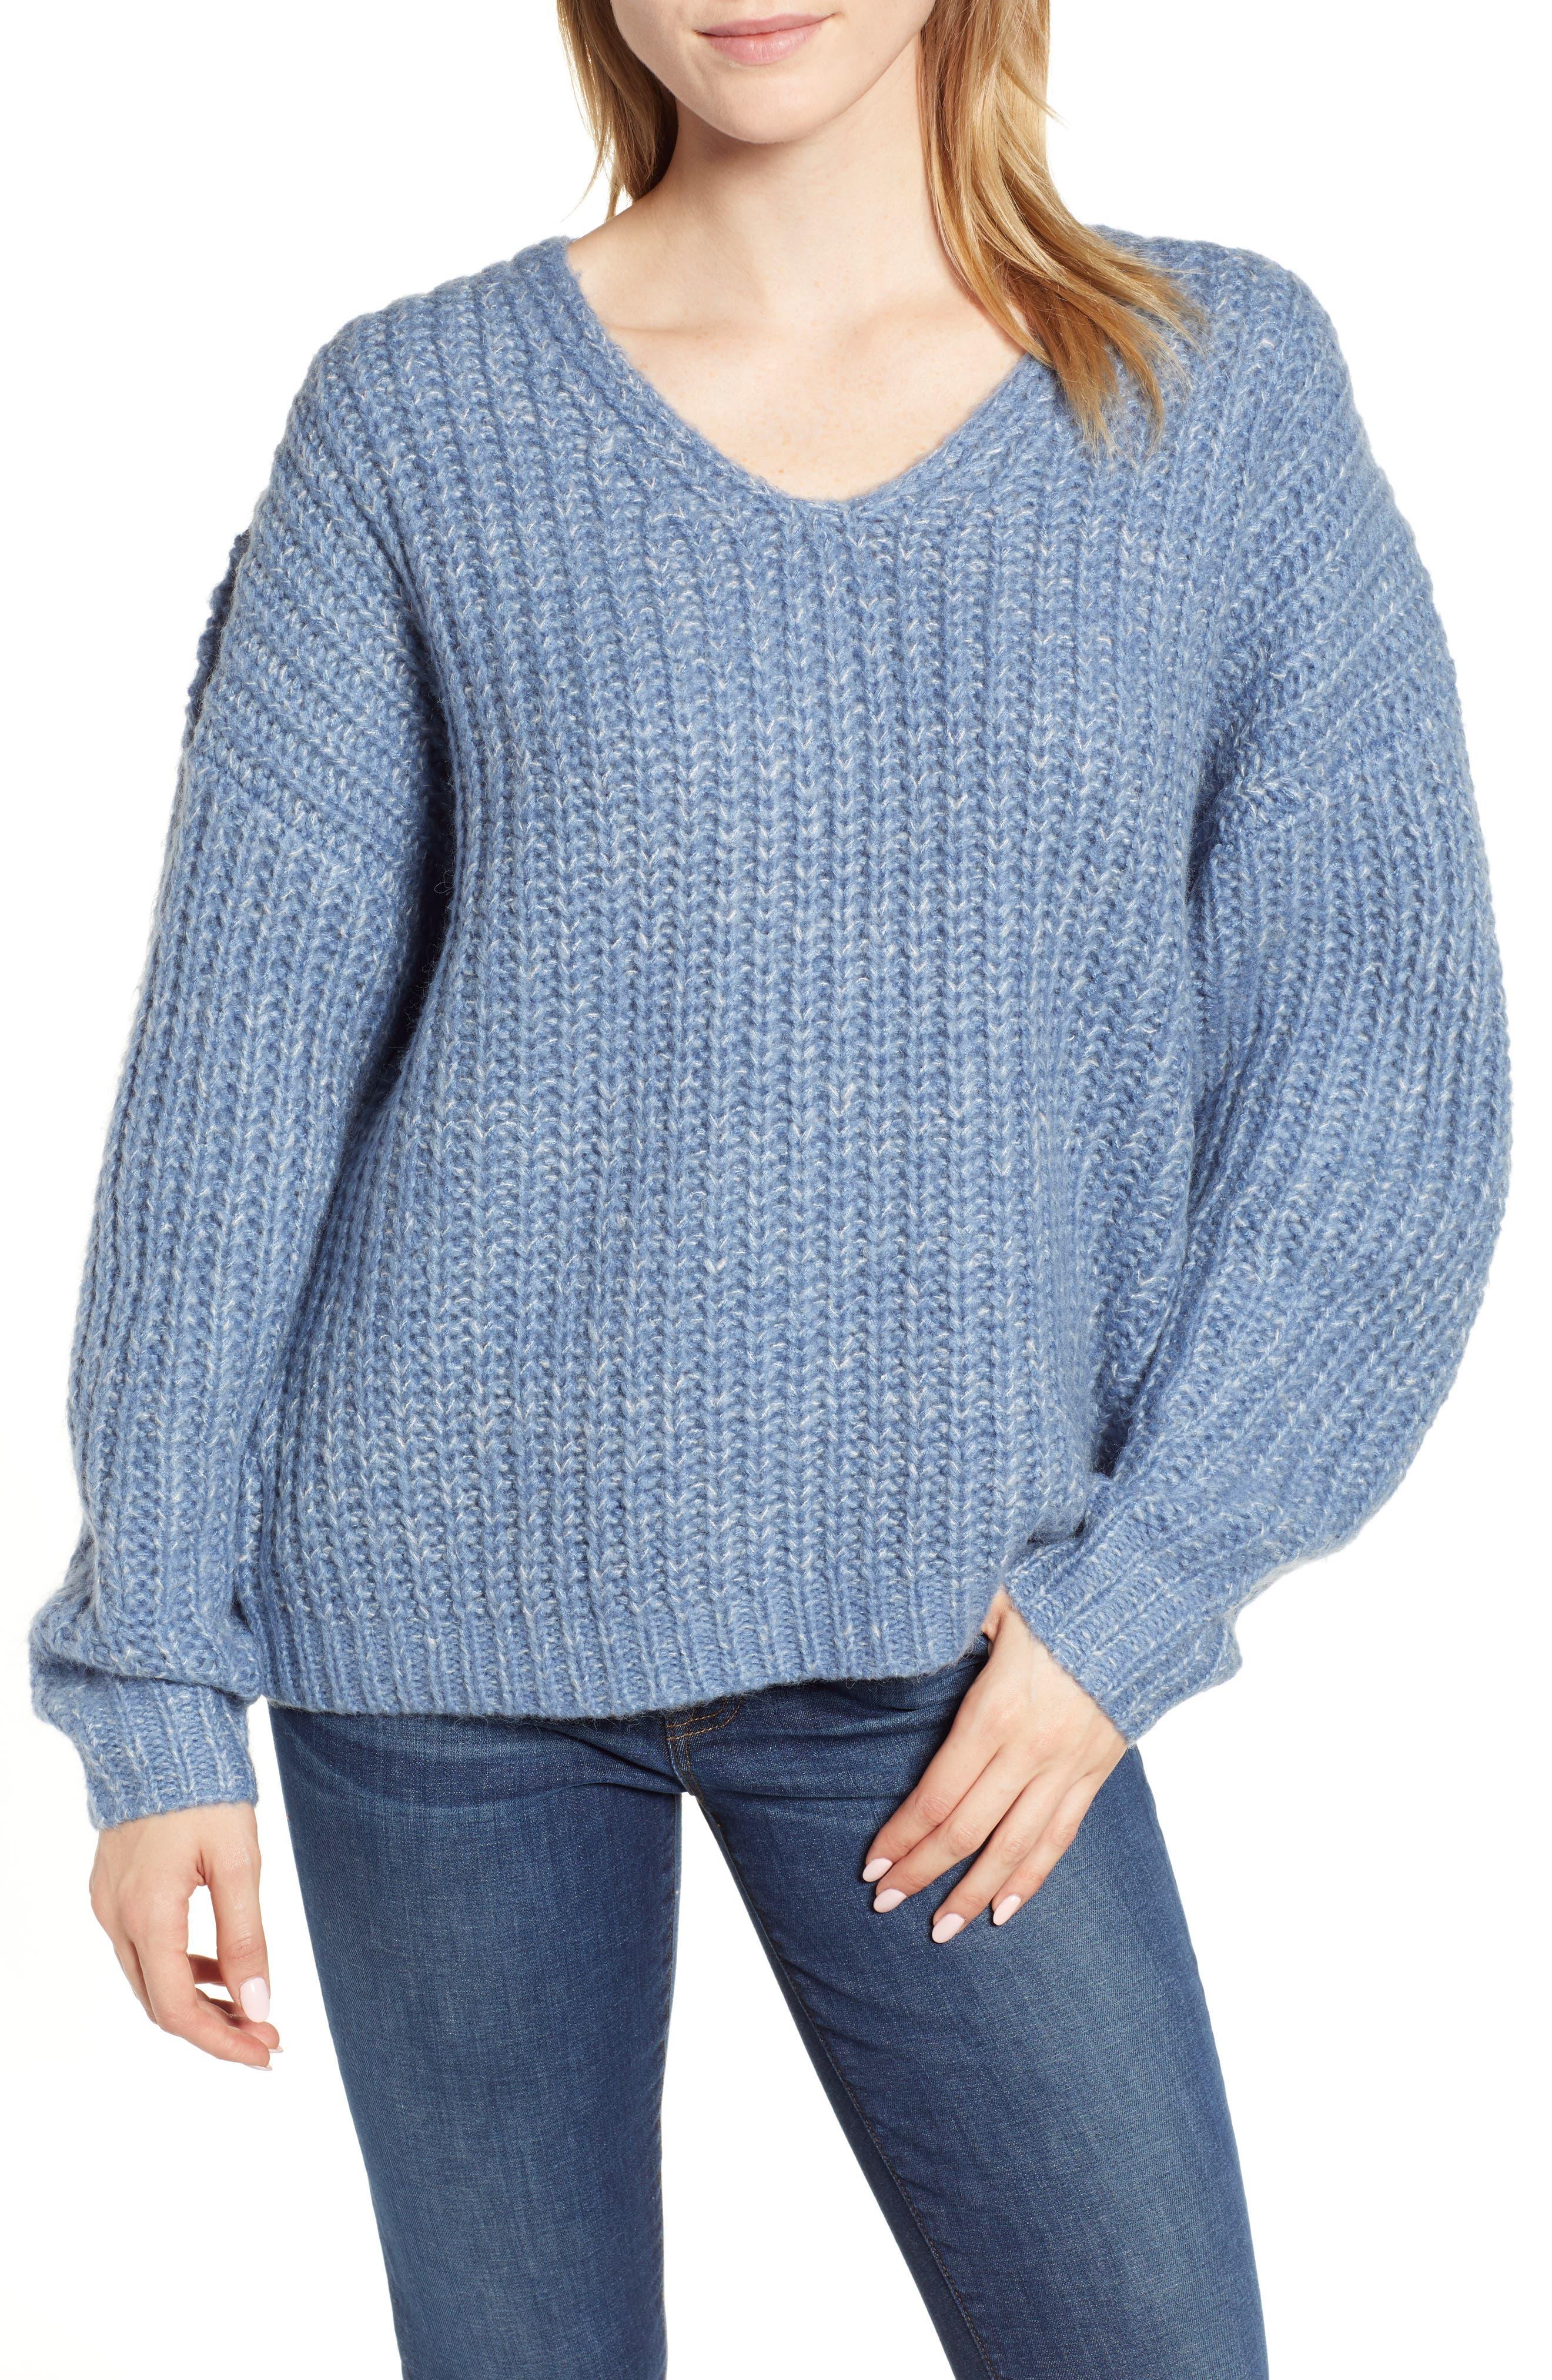 Dorit Sweater,                         Main,                         color, BLUE